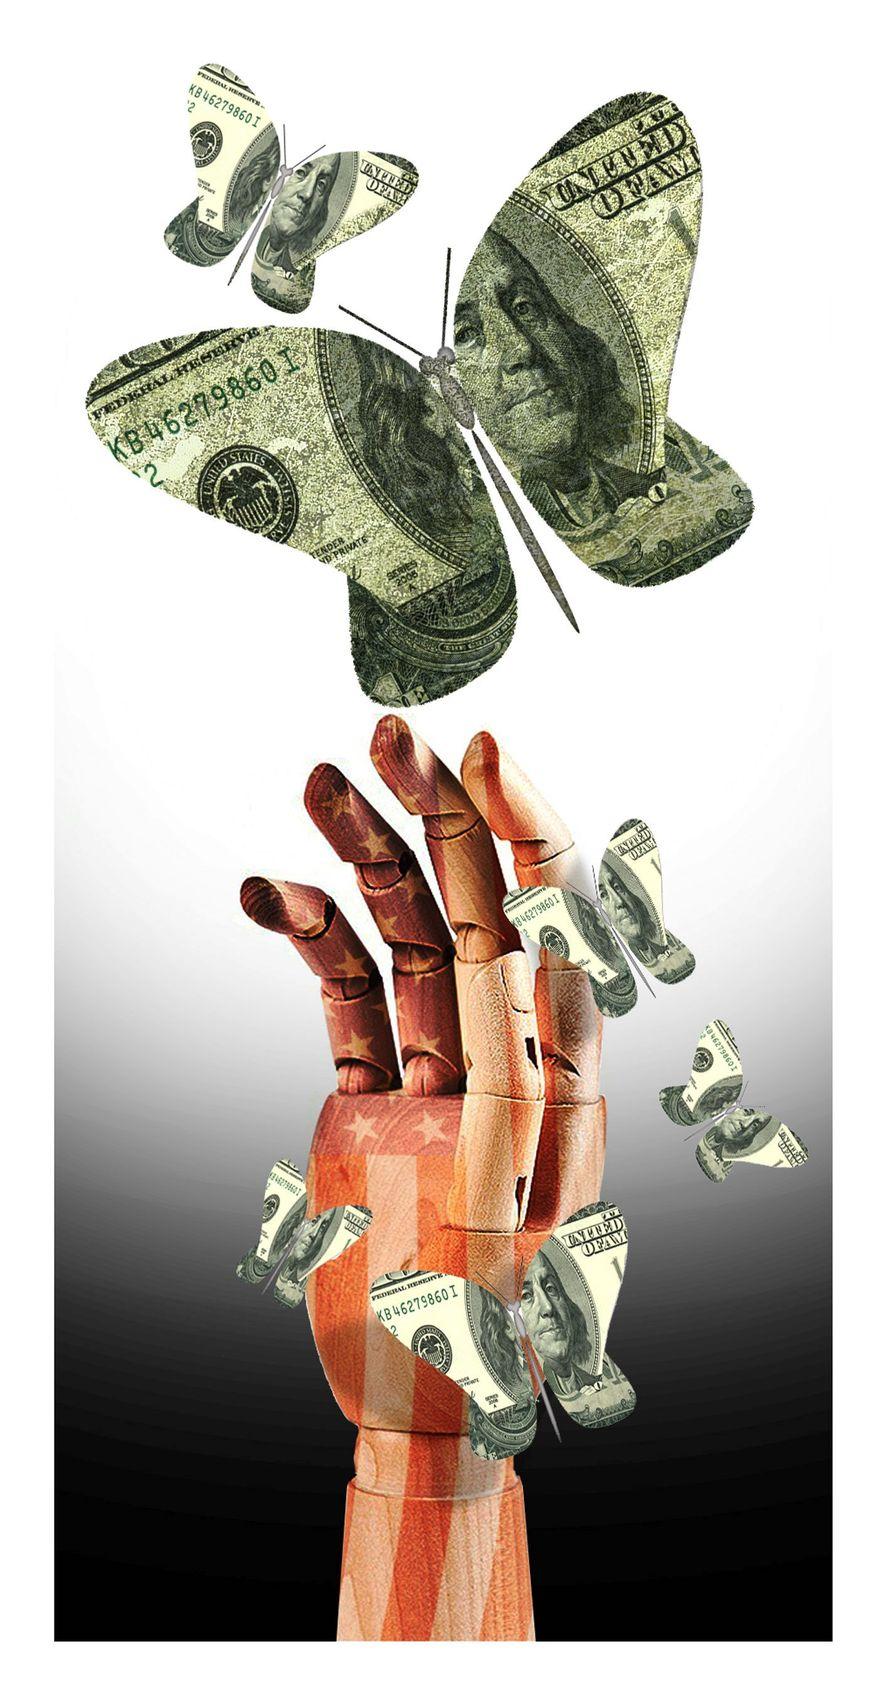 Illustration on paper money by Alexander Hunter/The Washington Times